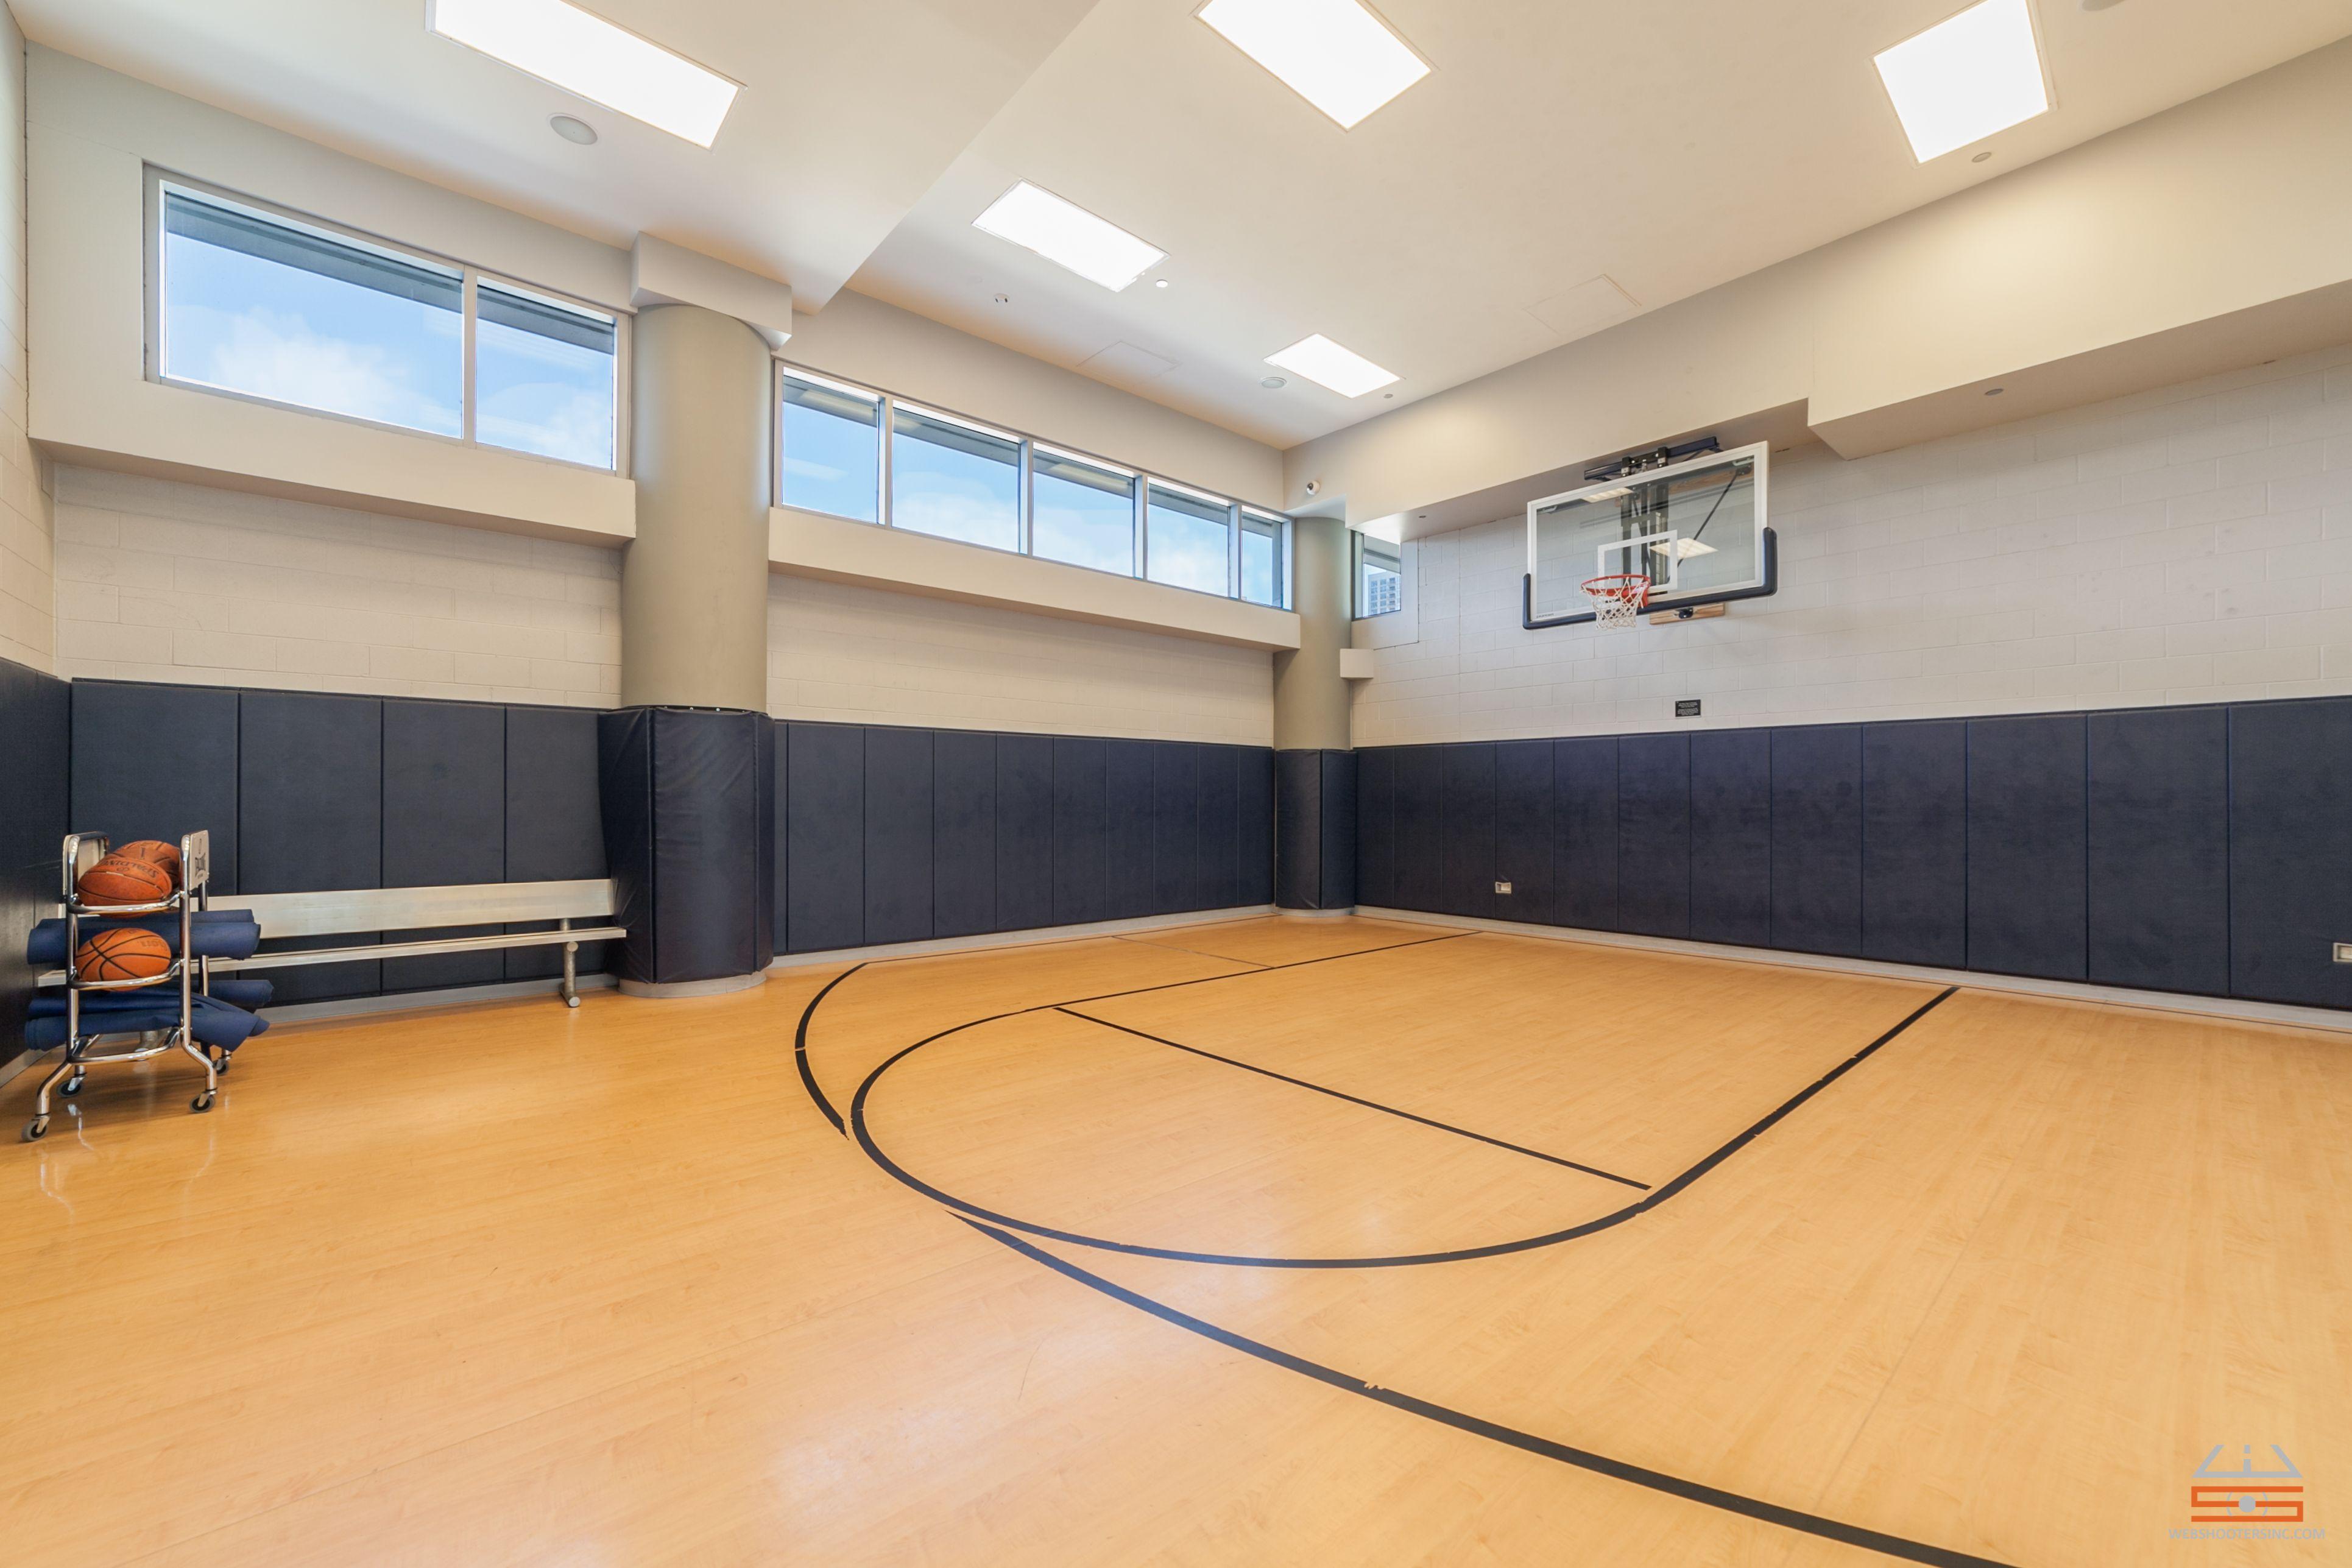 Basketball court in 2020 basketball court basketball court